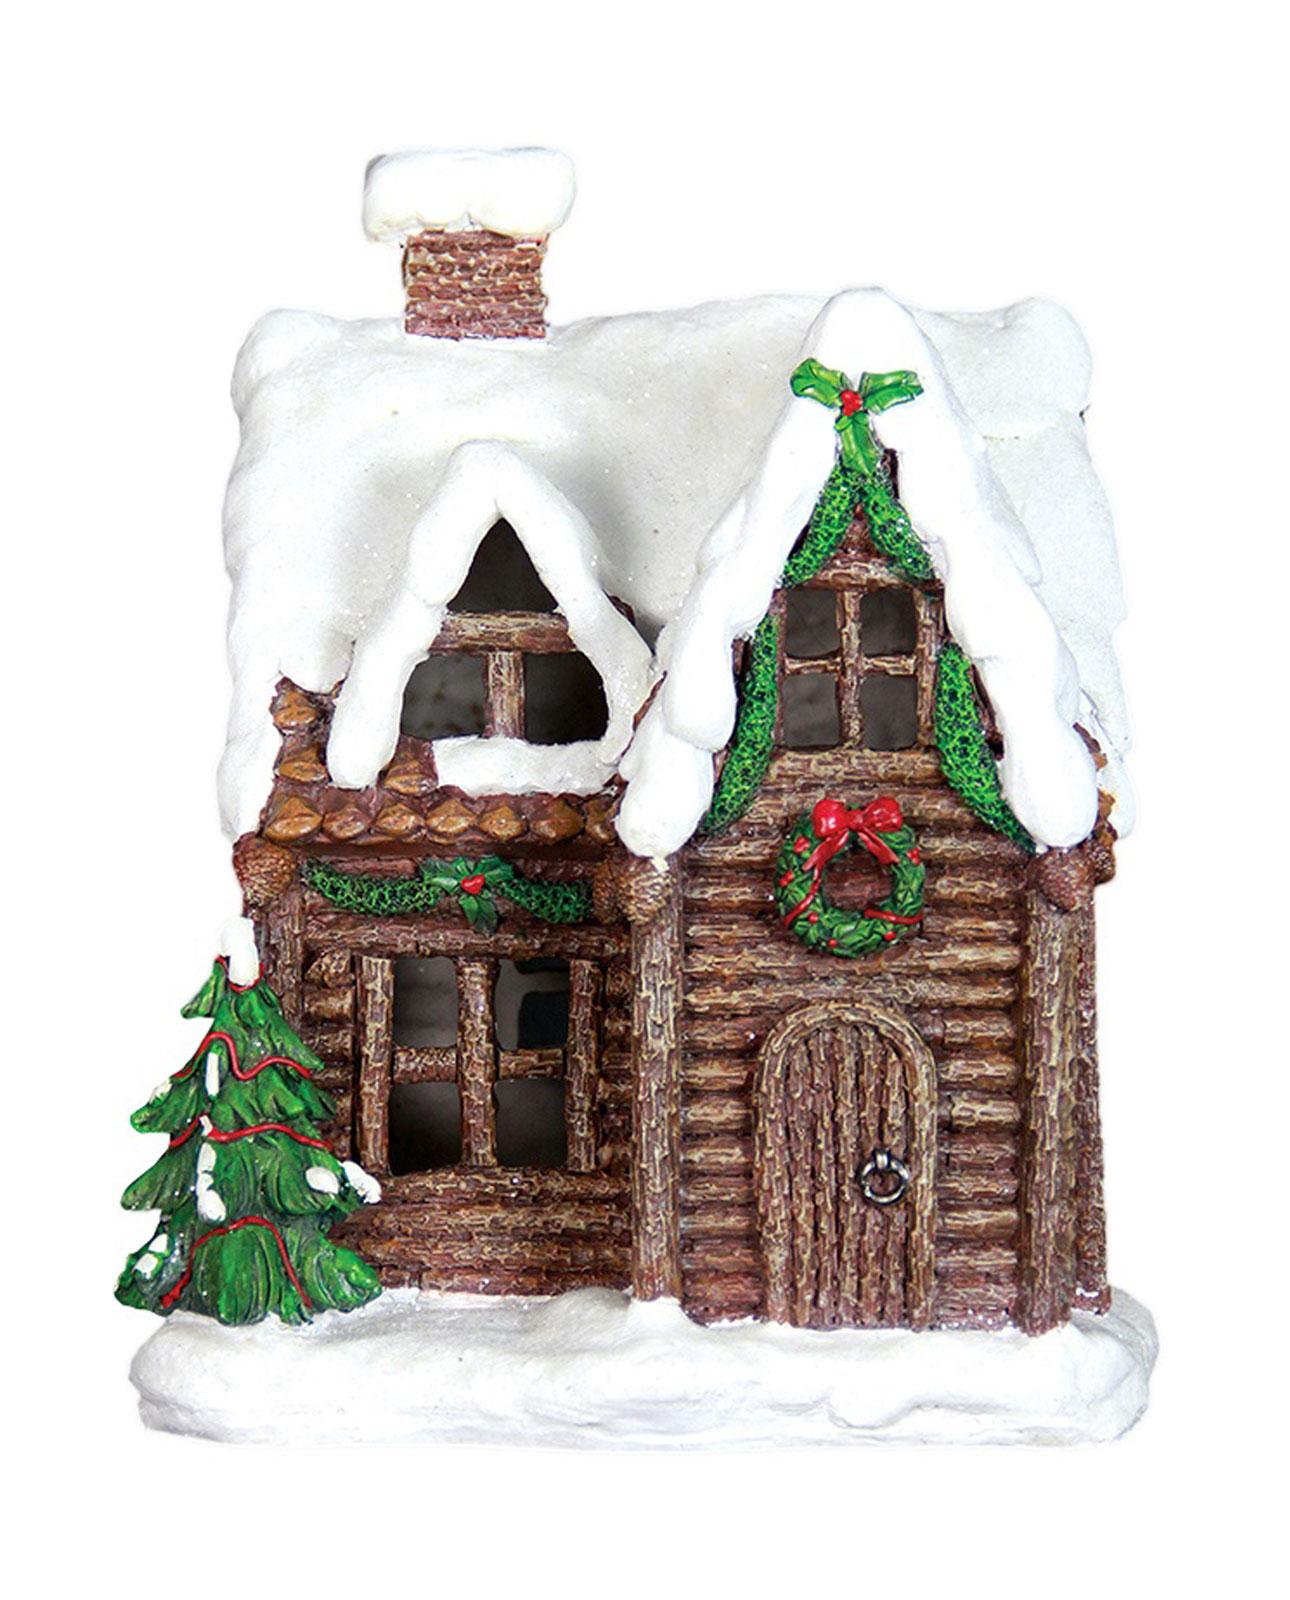 Christmas Decorations Santa Clarita Ca: LED Light Up Log Cabin Christmas Holiday Village Cottage